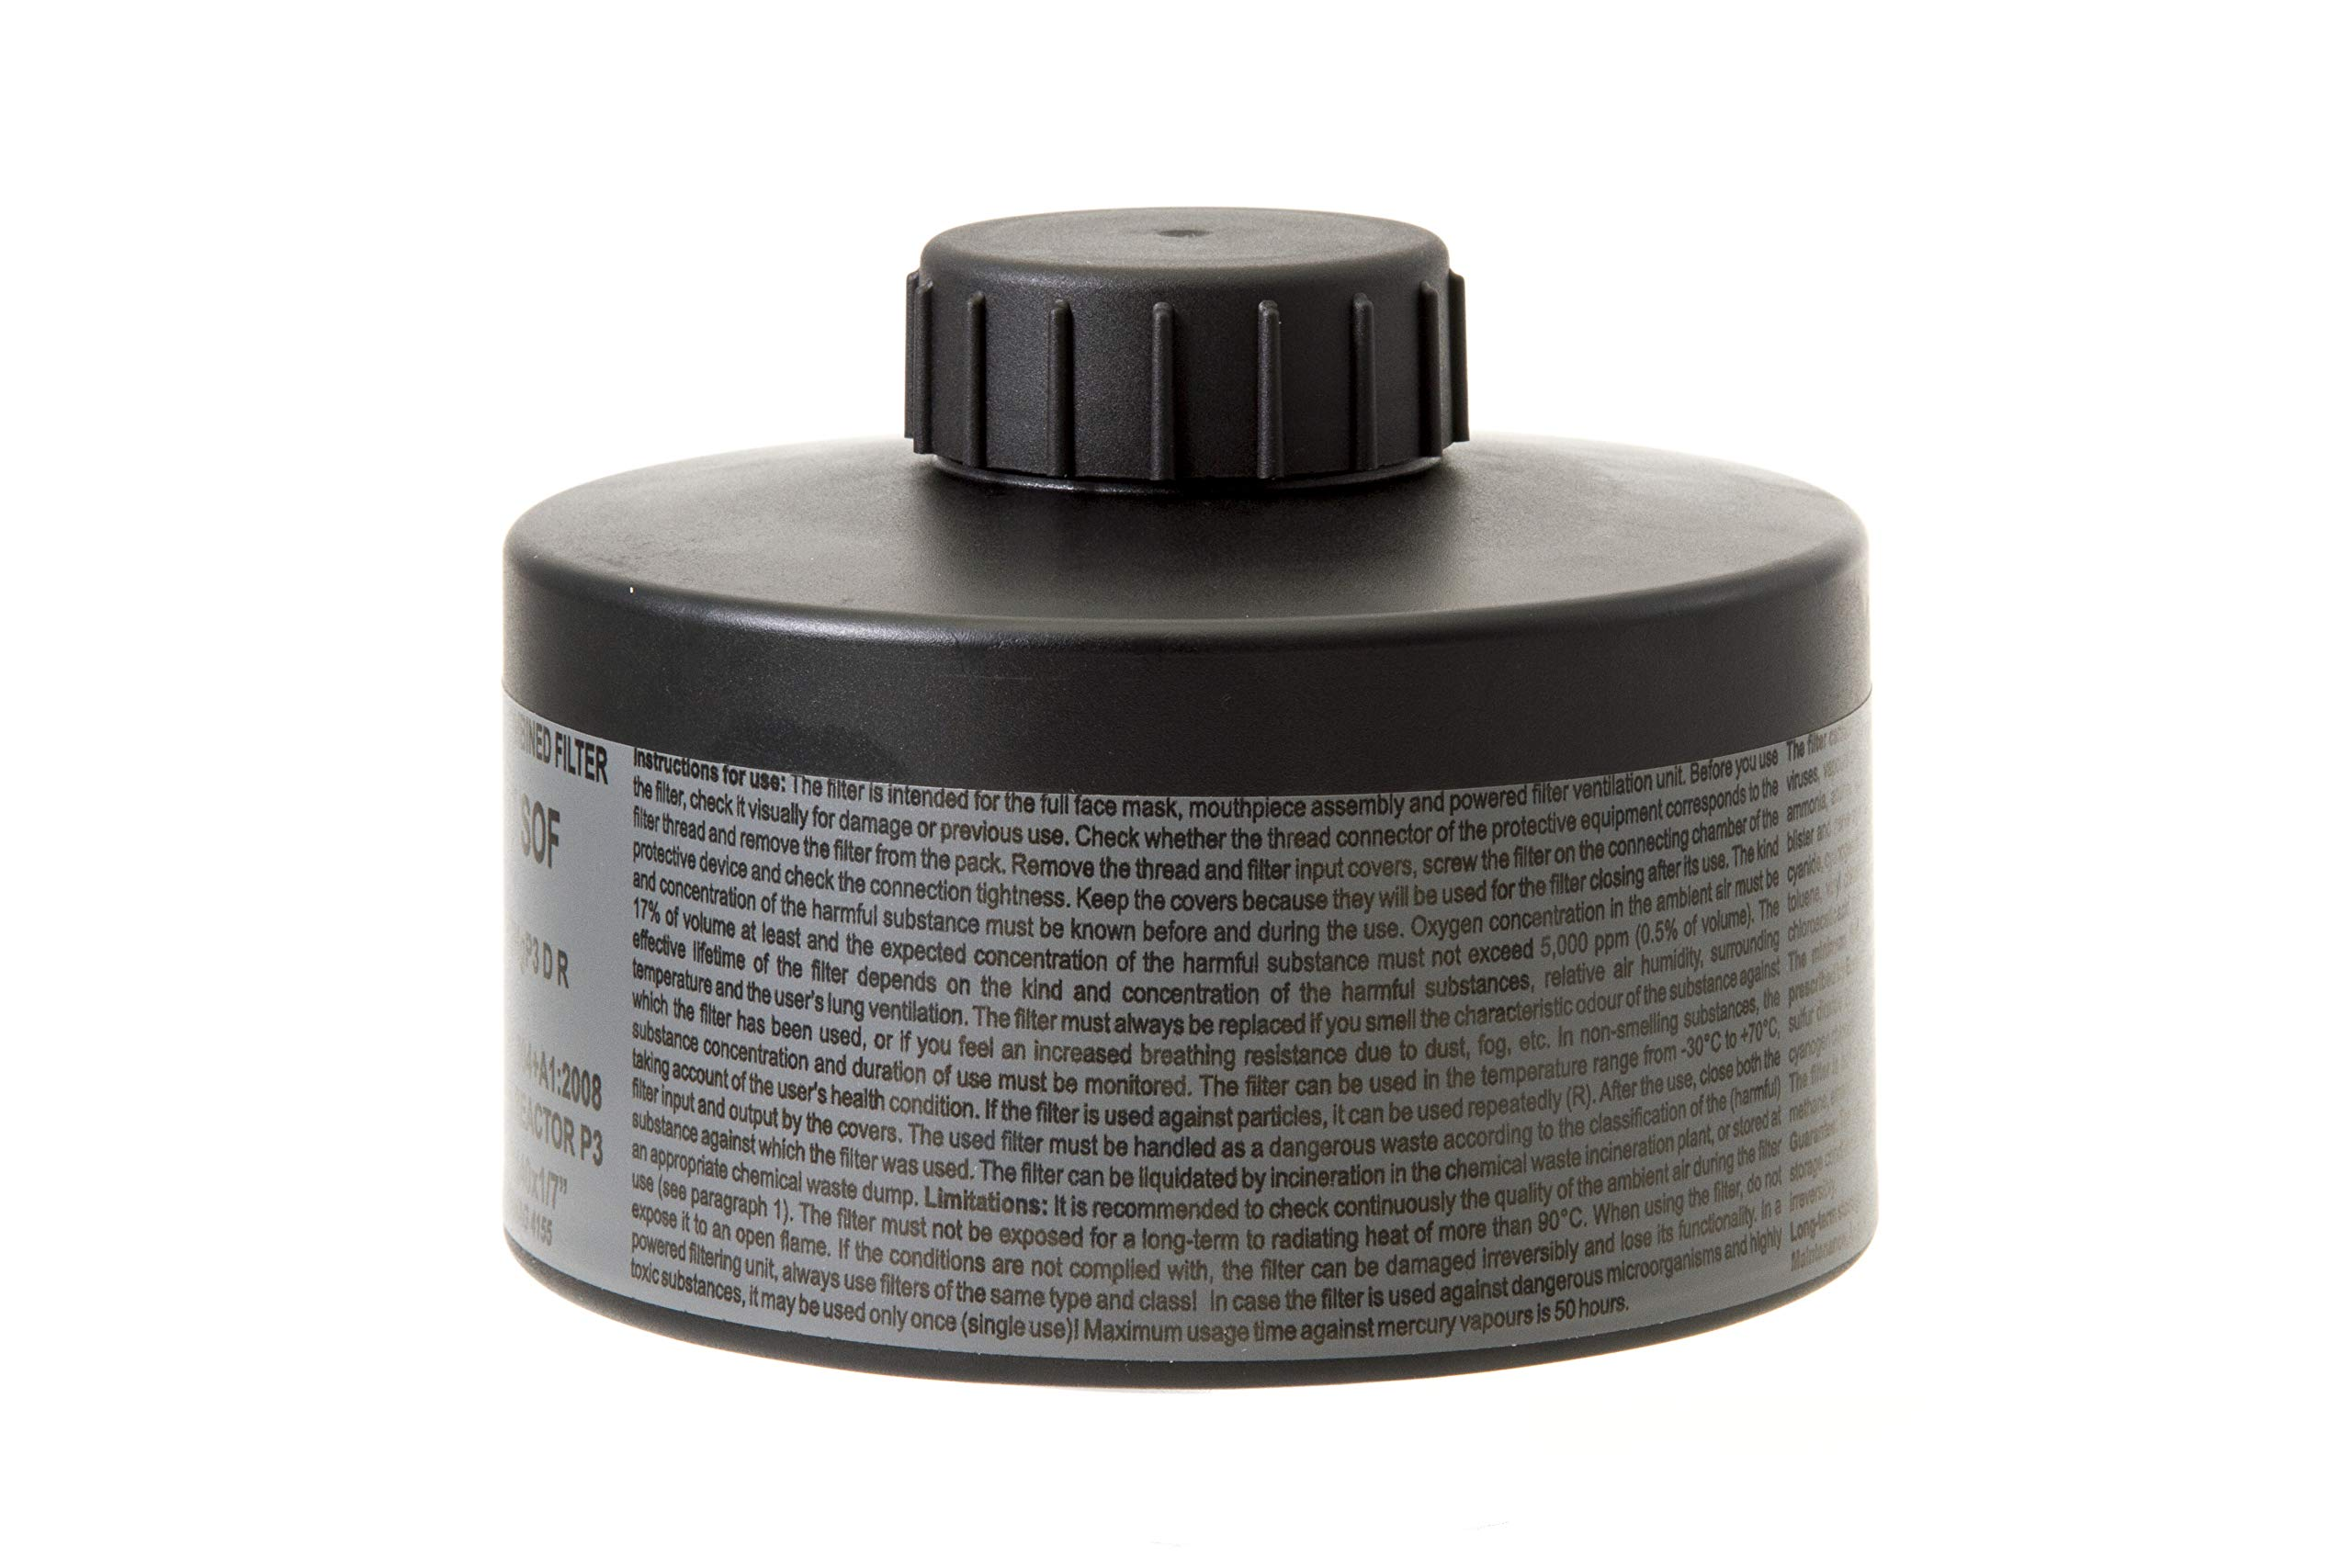 MIRA Multi Gas Vapor Cartridge Respiratory Protection 20 Years Shelf Life CBRN NBC Grade (Mira Filter) by MIRA SAFETY M (Image #4)